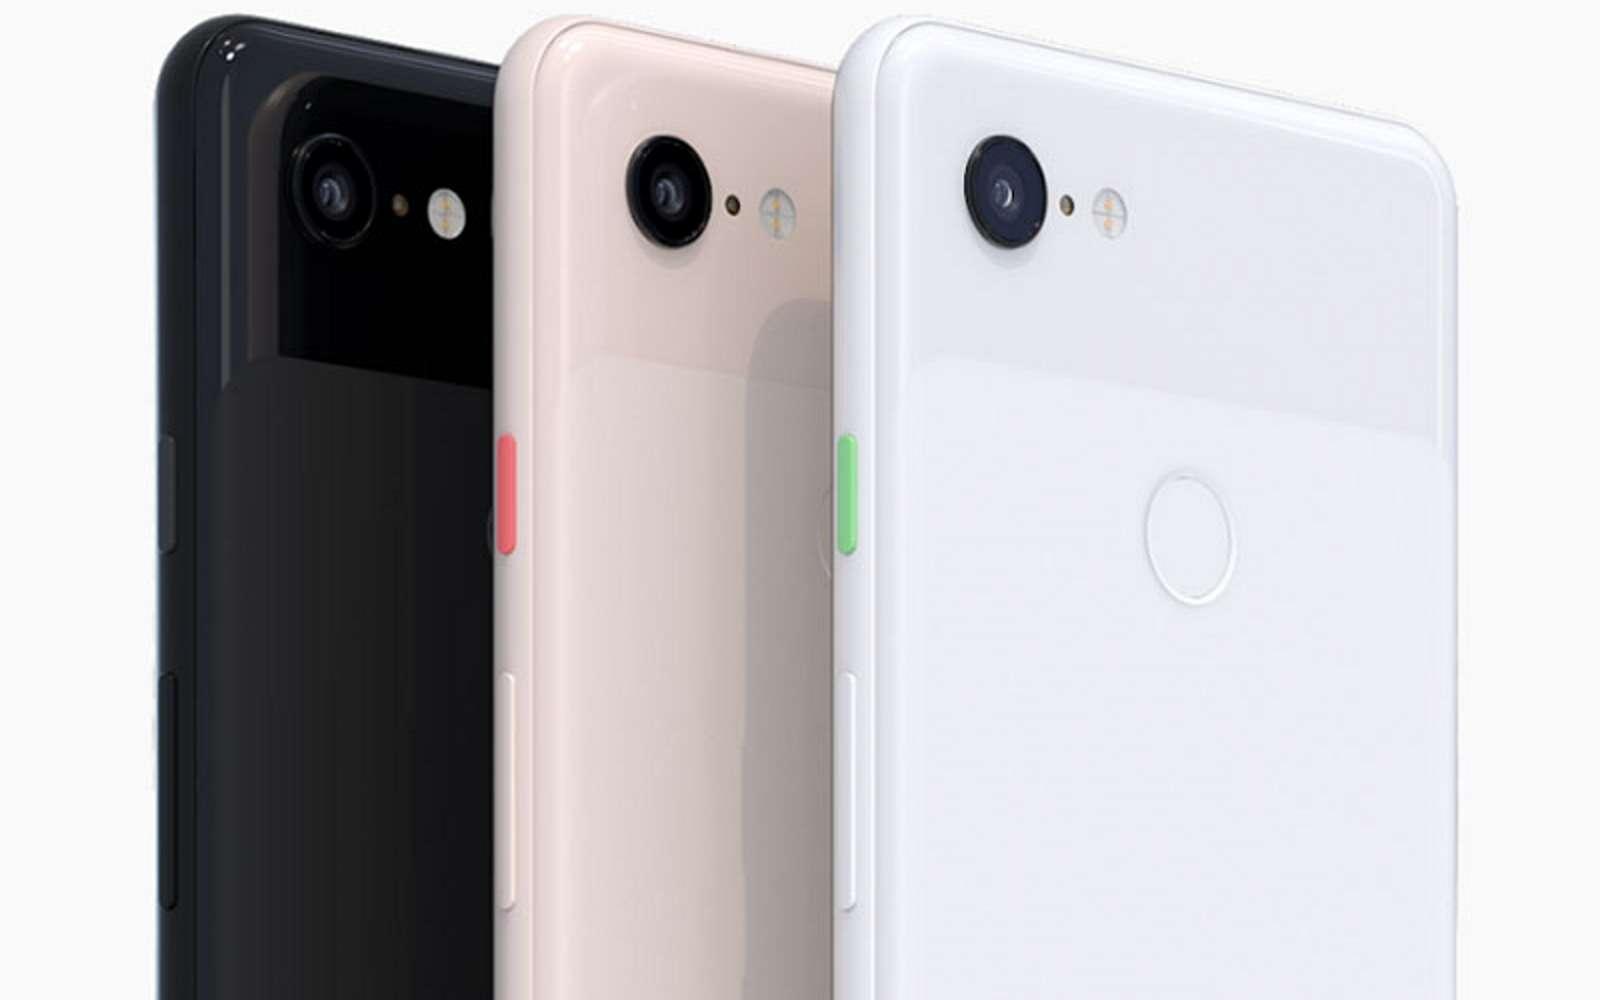 Bon plan : Google Pixel 3 à 449 euros au lieu de 759 euros chez RED by SFR !